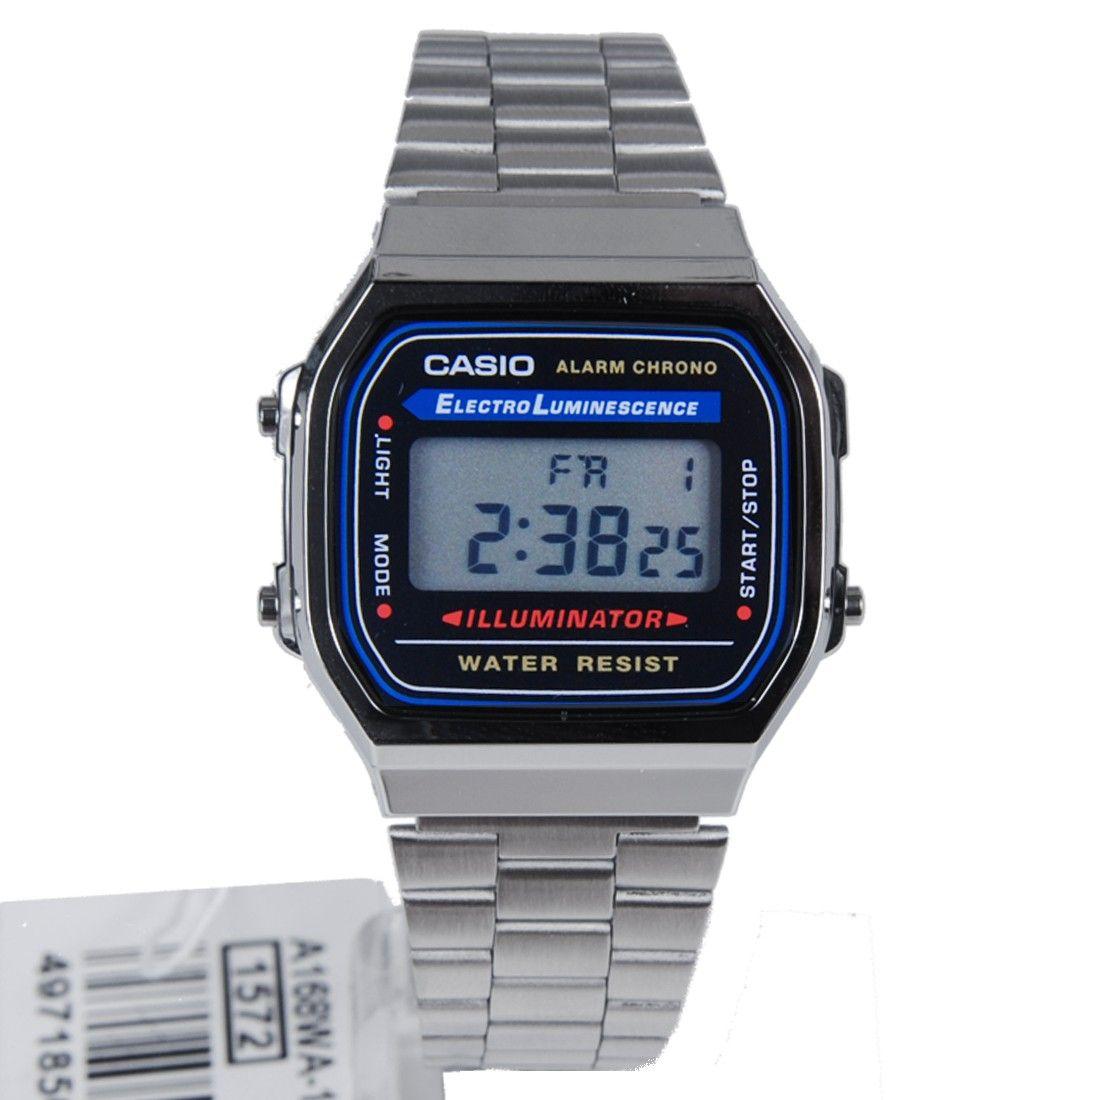 cd0236c8ba90 Casio Illuminator Mens Digital Alarm Watch A168 A168W A168WA-1U ...